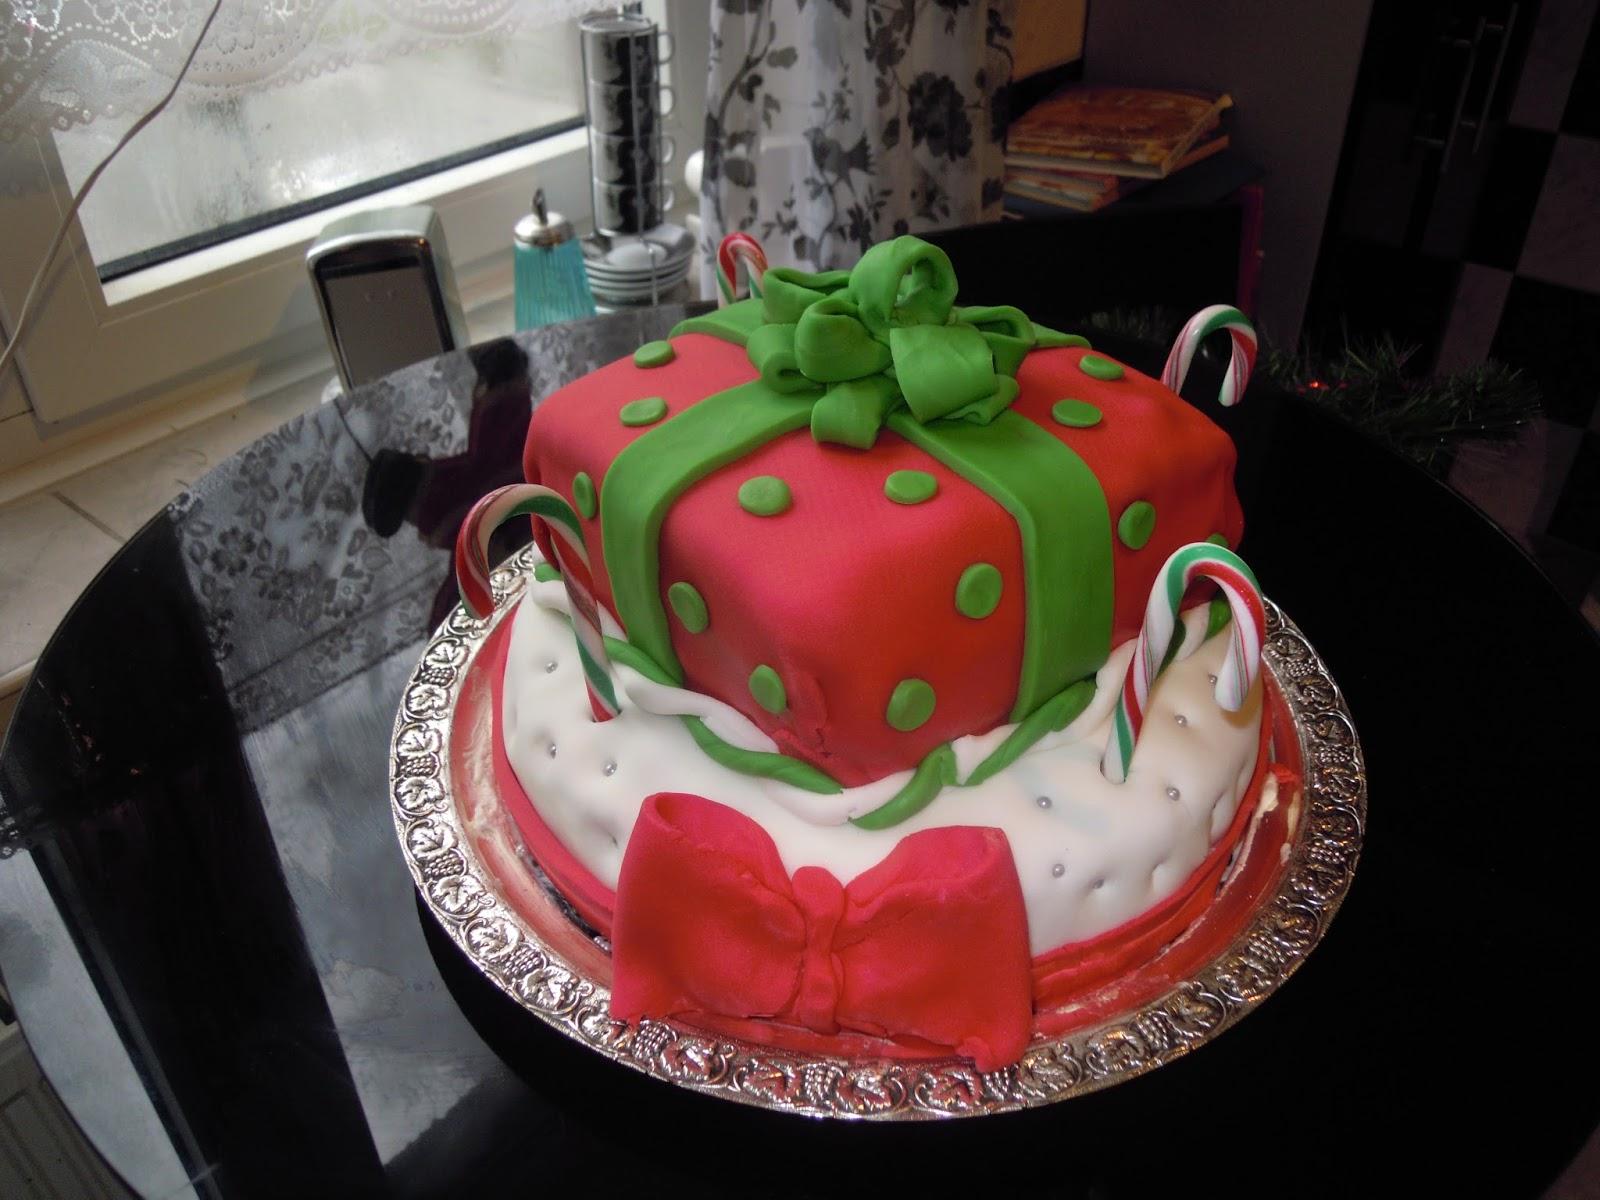 Ruffle Cake also Princess Cushionpillow Cake Handmade Fondant Tiara in addition Sahovska Figura Lovac further 14 Pomme Amor furthermore Buche Noel Chocolat Croustillante 171110 199706. on design for fondant